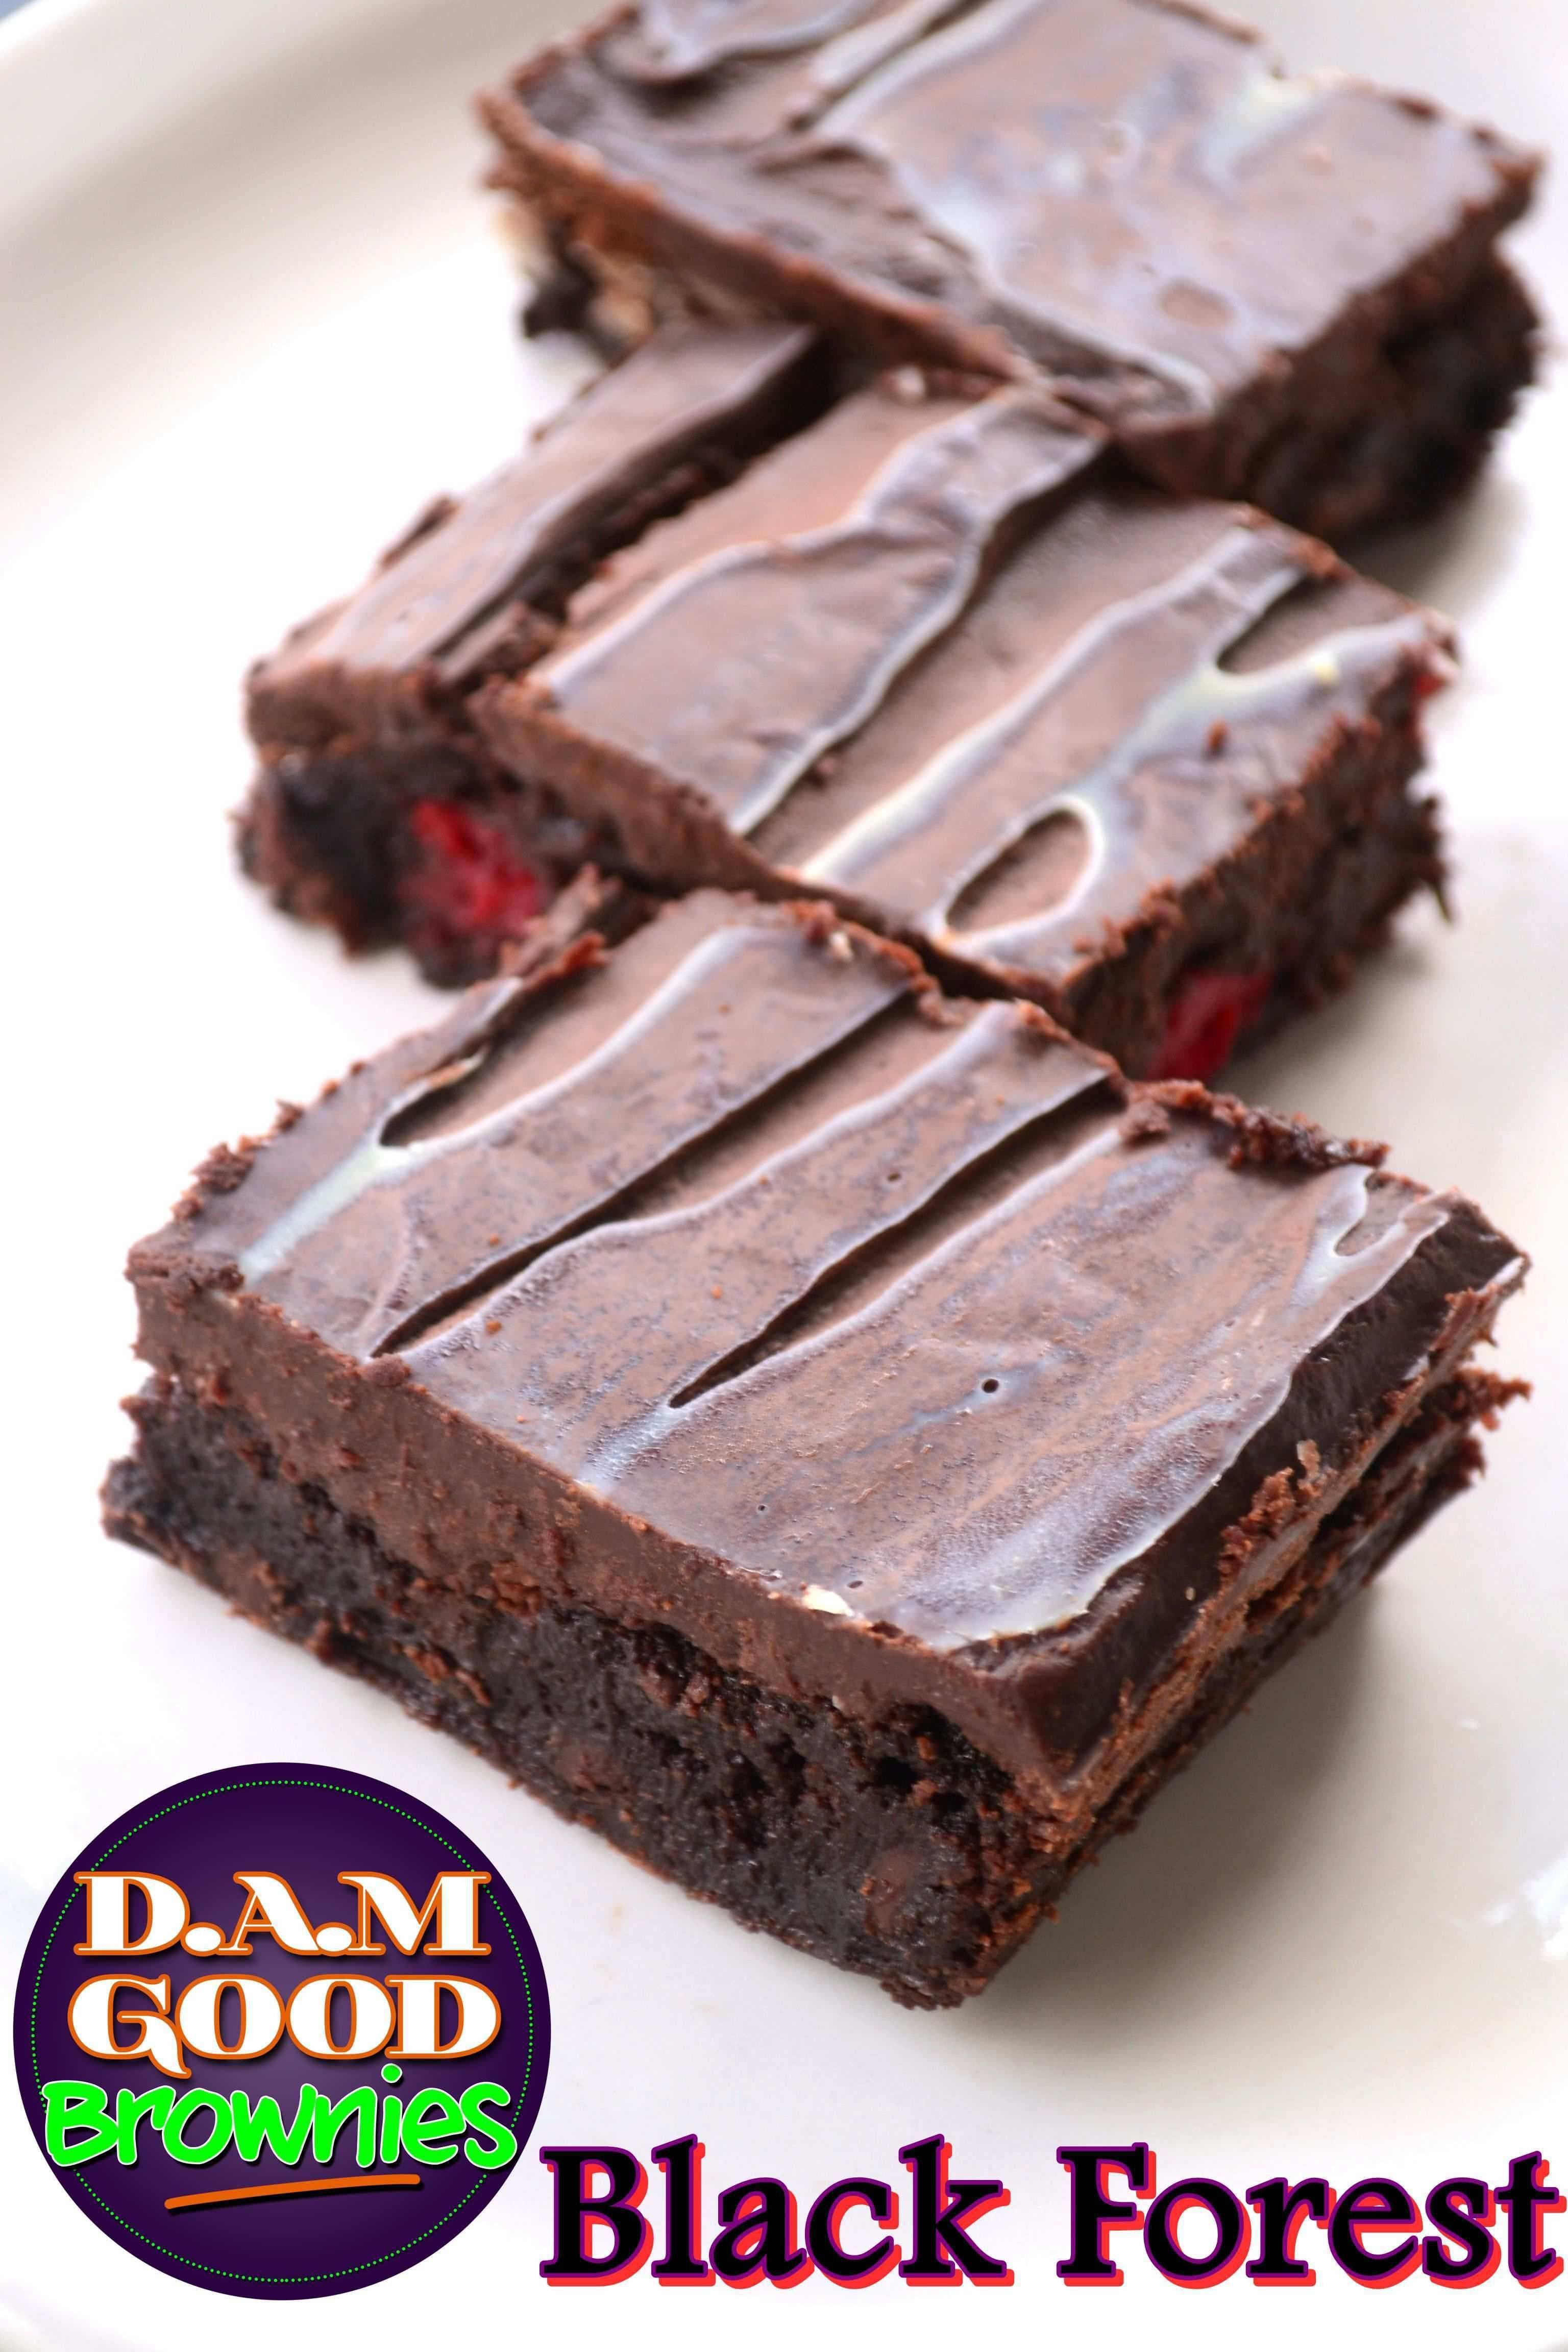 DAMGood Black Forest Brownies - 6pk